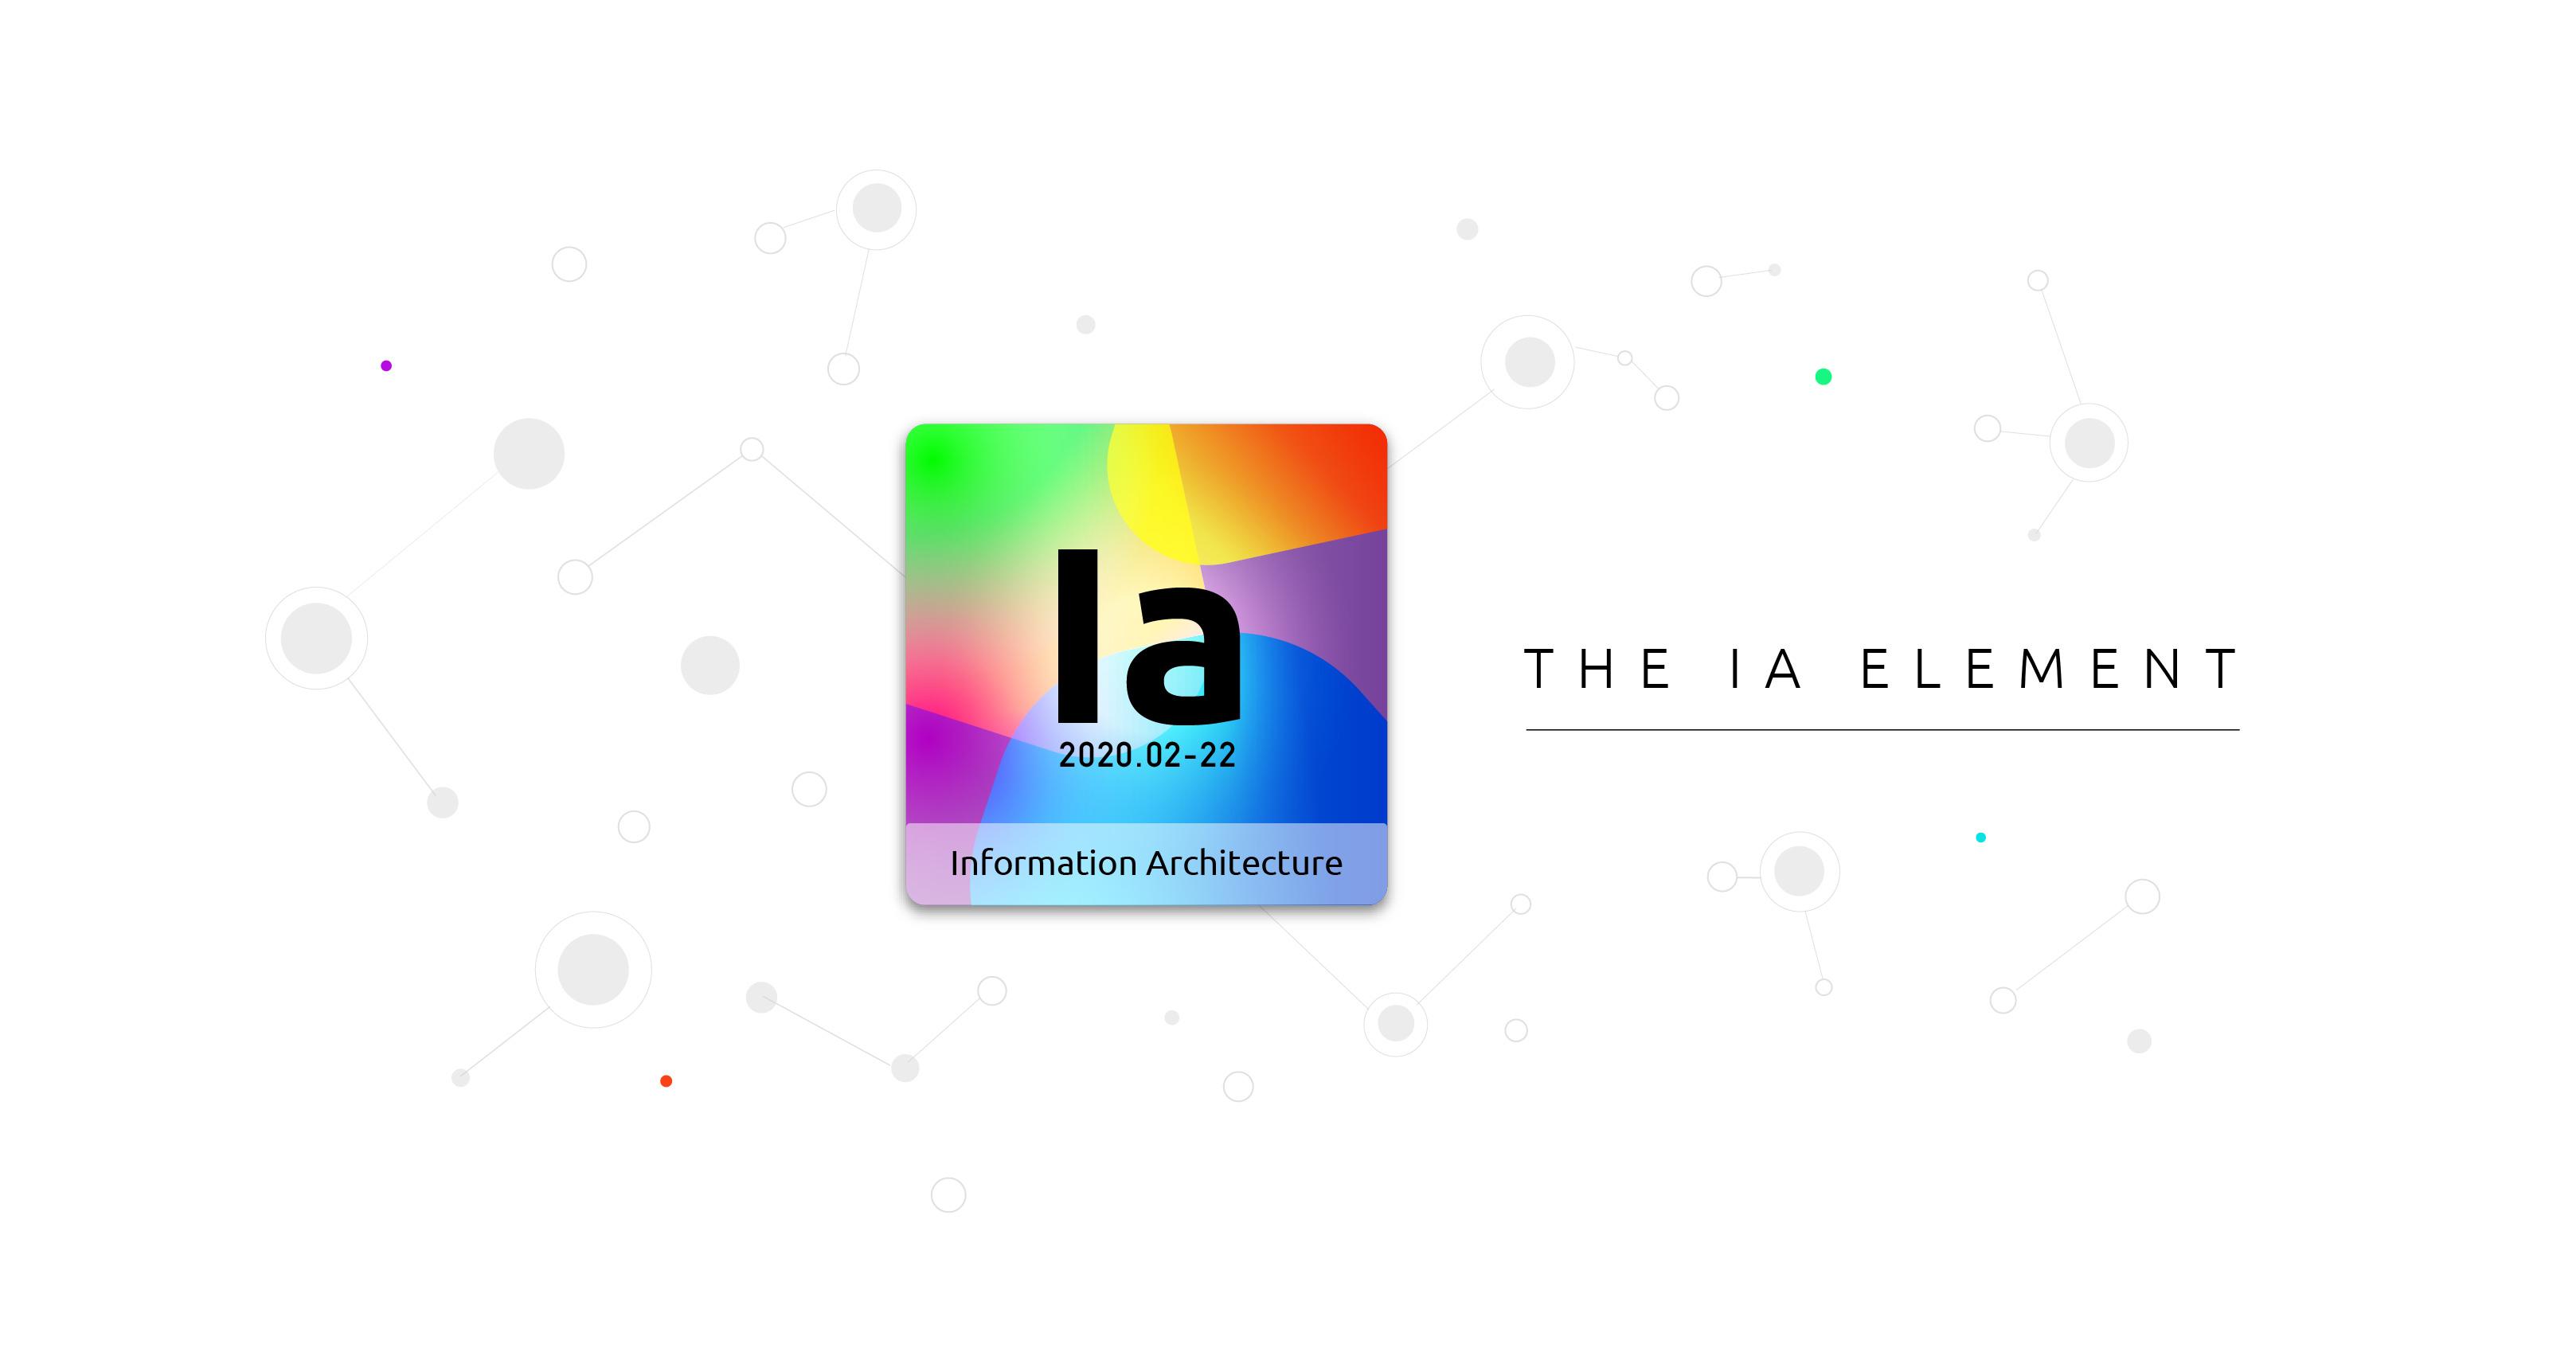 The IA Element